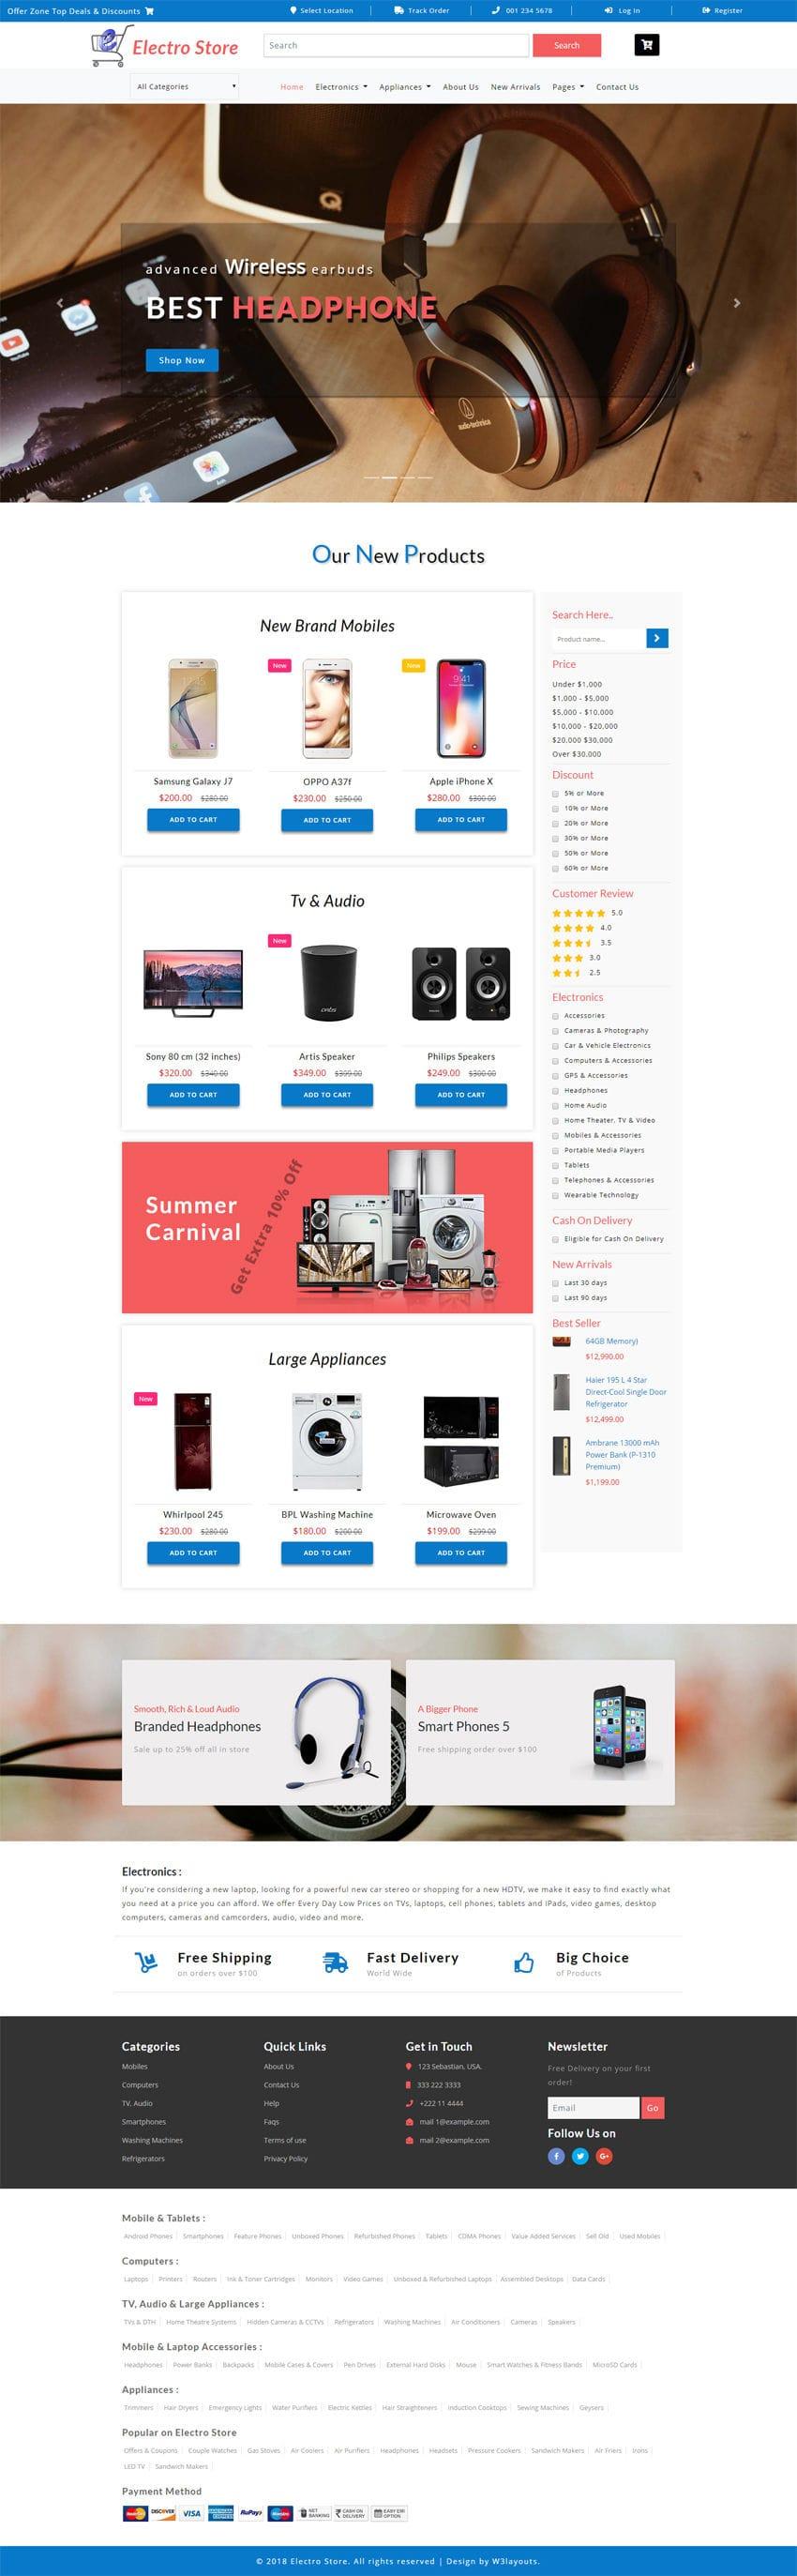 Electro Store Full Screenshot